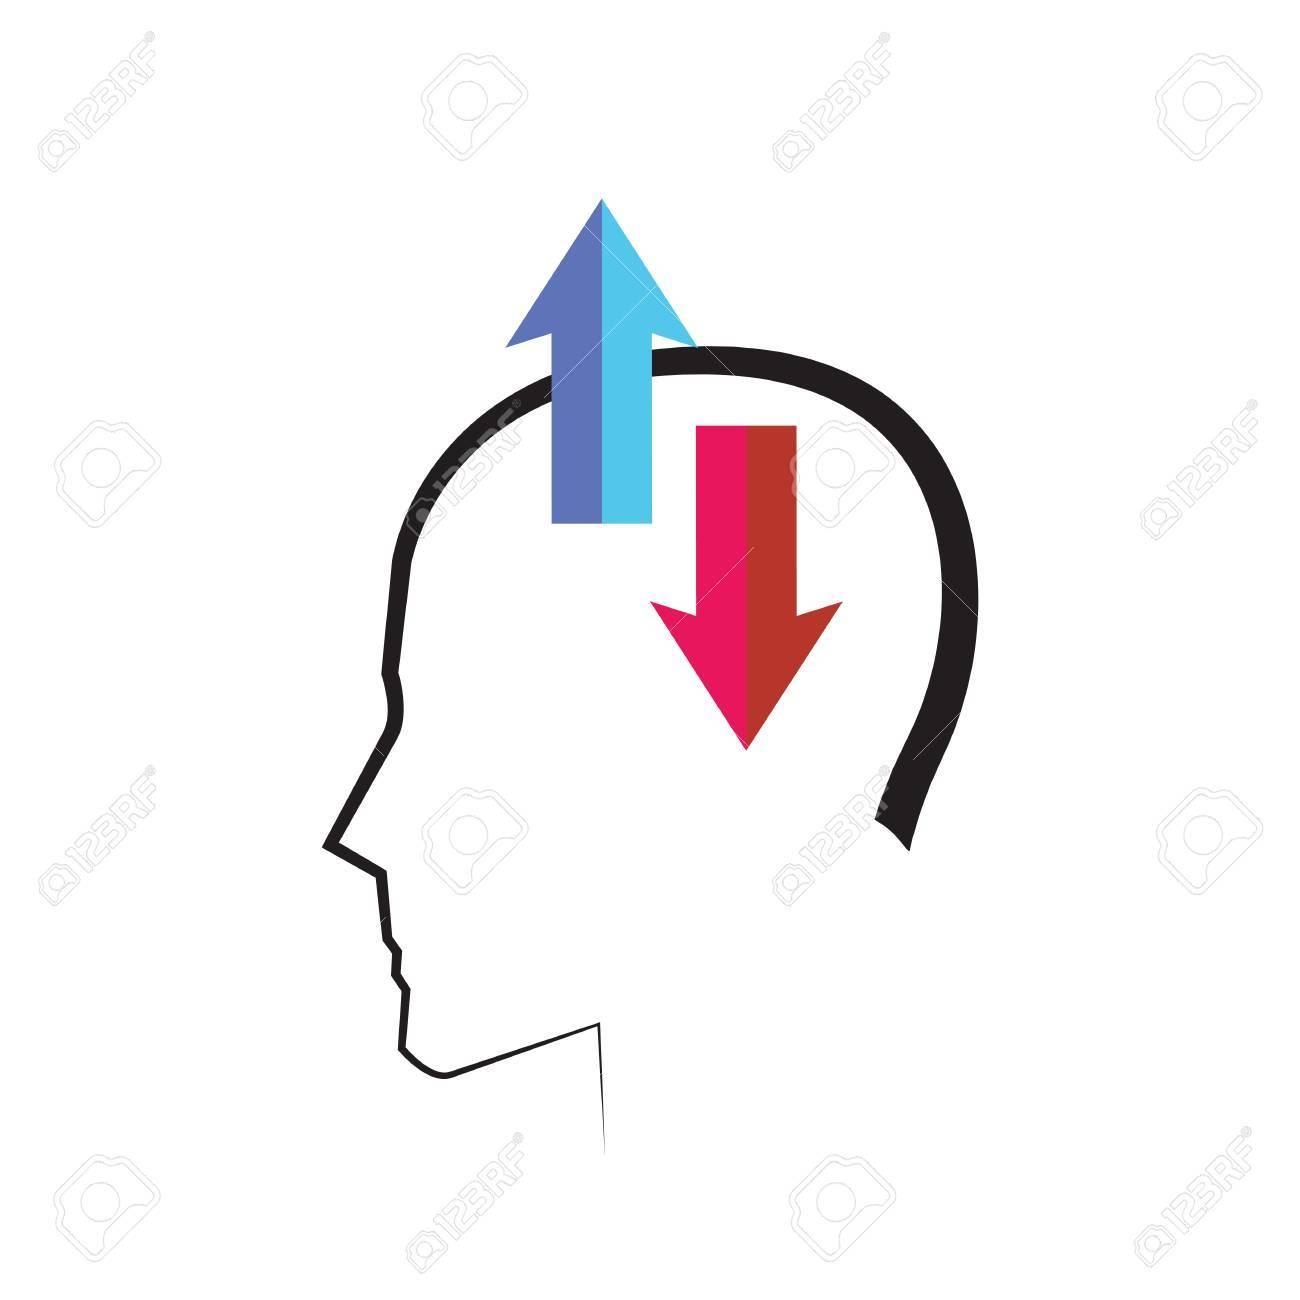 Mental Concept Design. AI 10 supported. - 62815513